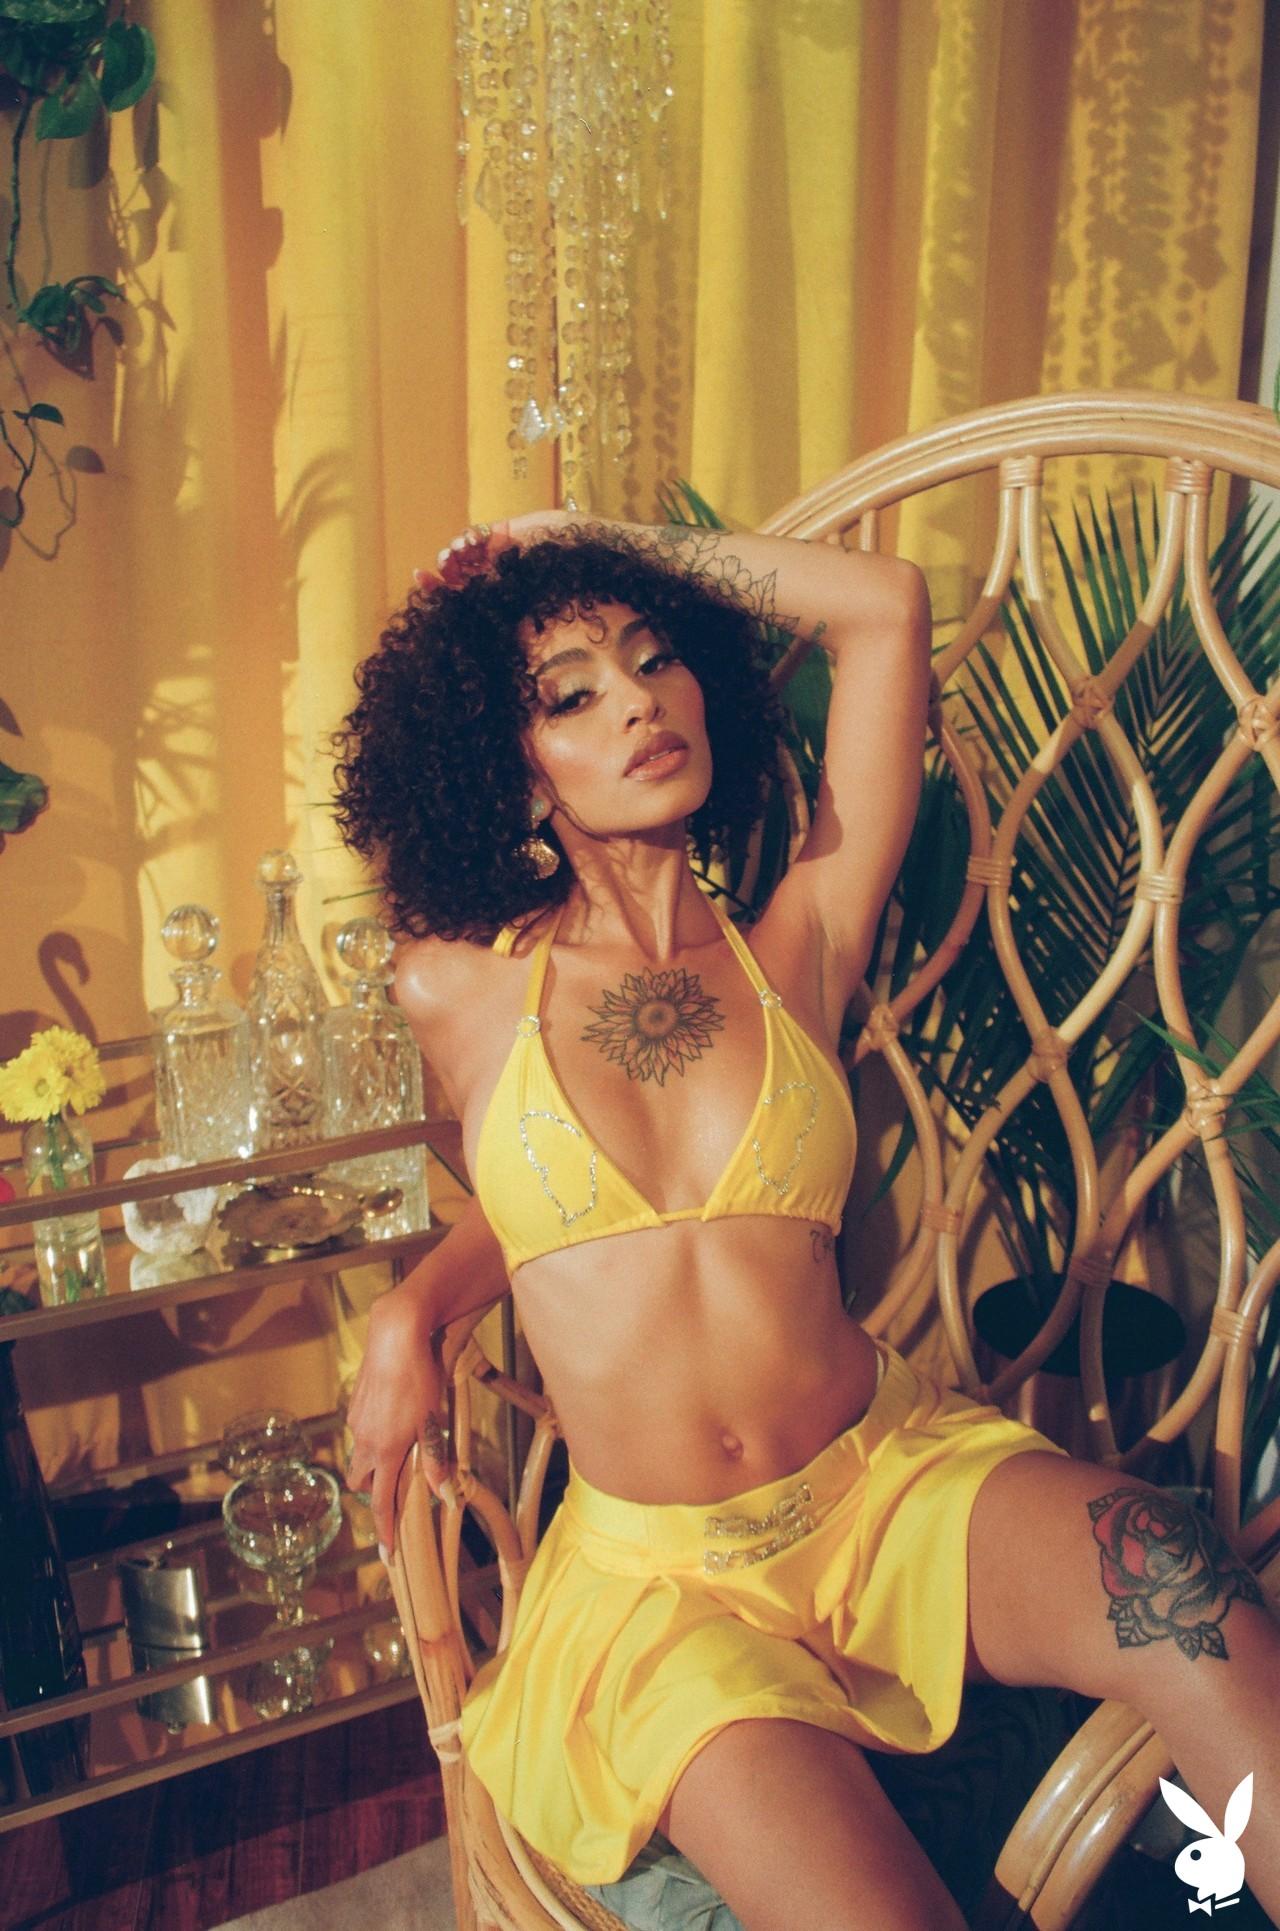 Sunni In Hey Sunshine Playboy Plus (1)